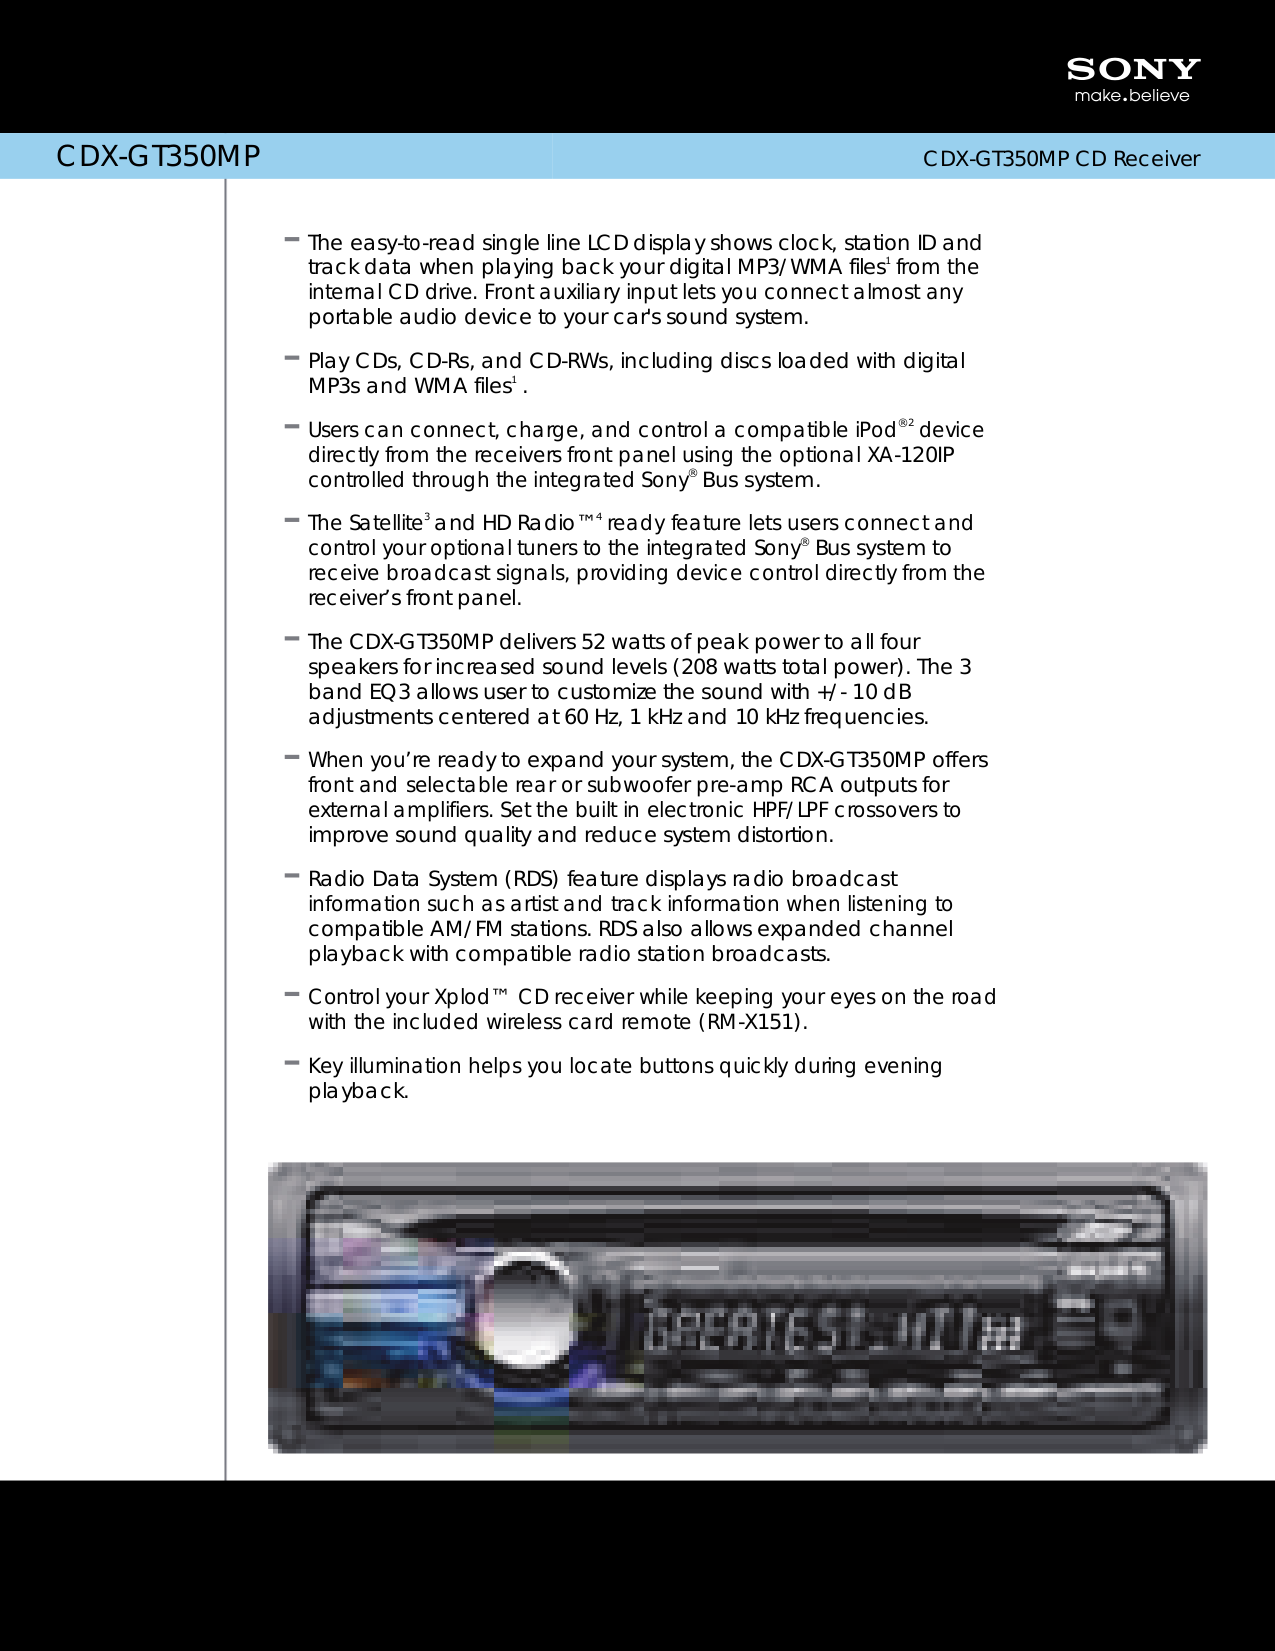 Groß Sony Cdx Gt350mp Schaltplan Fotos - Schaltplan Serie Circuit ...